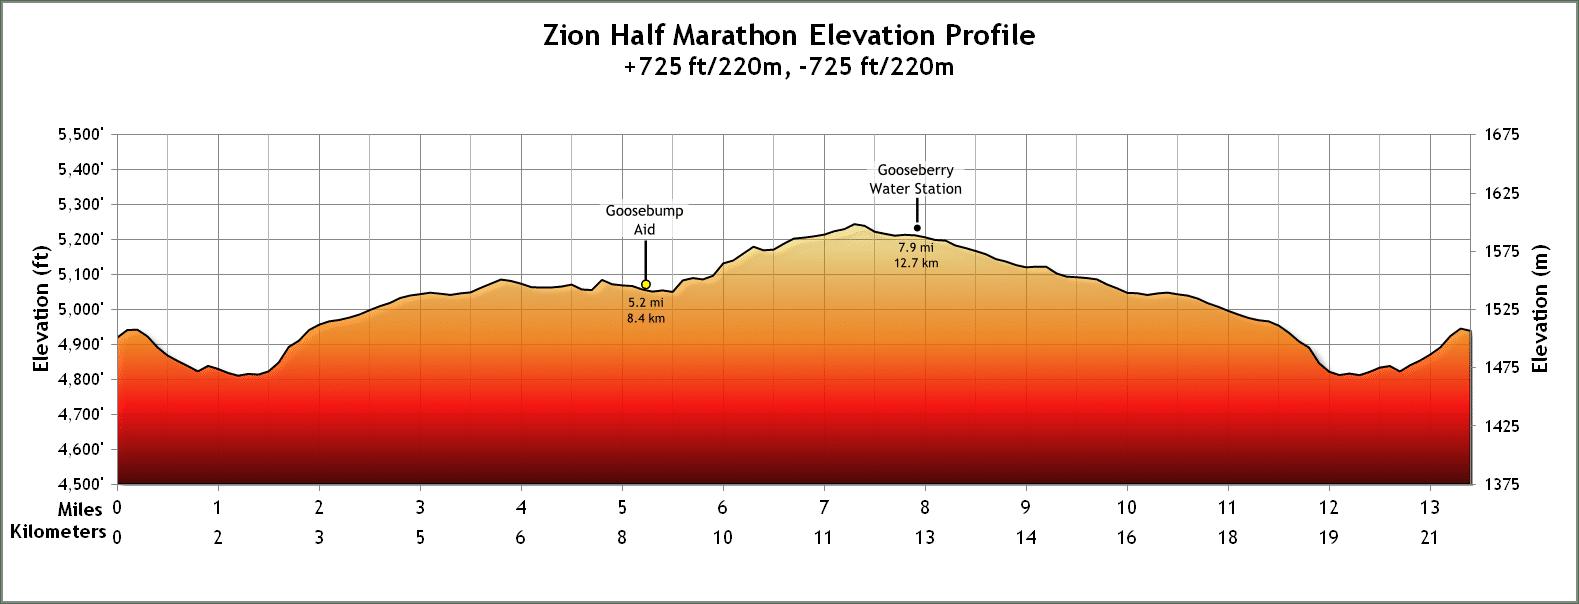 Elevation profile of the Zion Ultras trail half marathon